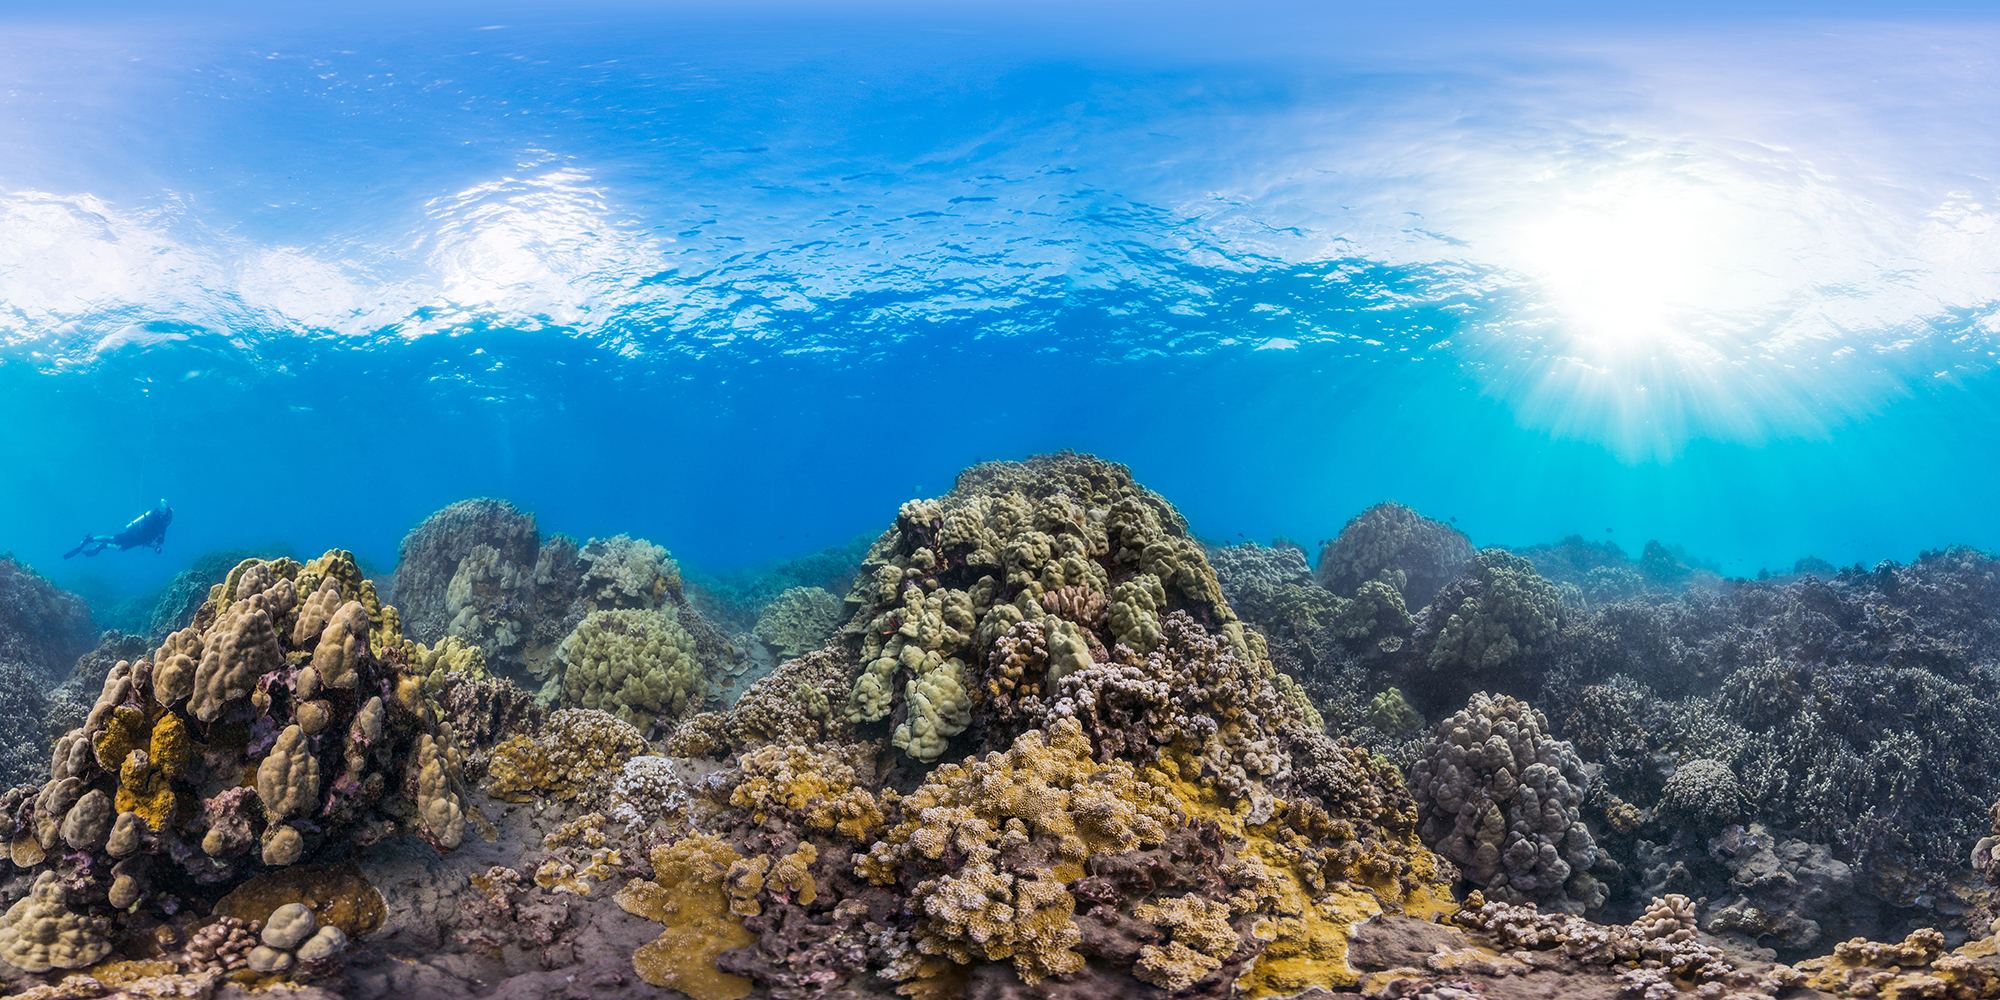 GREAT BARRIER REEF CREDIT: THE OCEAN AGENCY / XL CATLIN SEAVIEW SURVEY